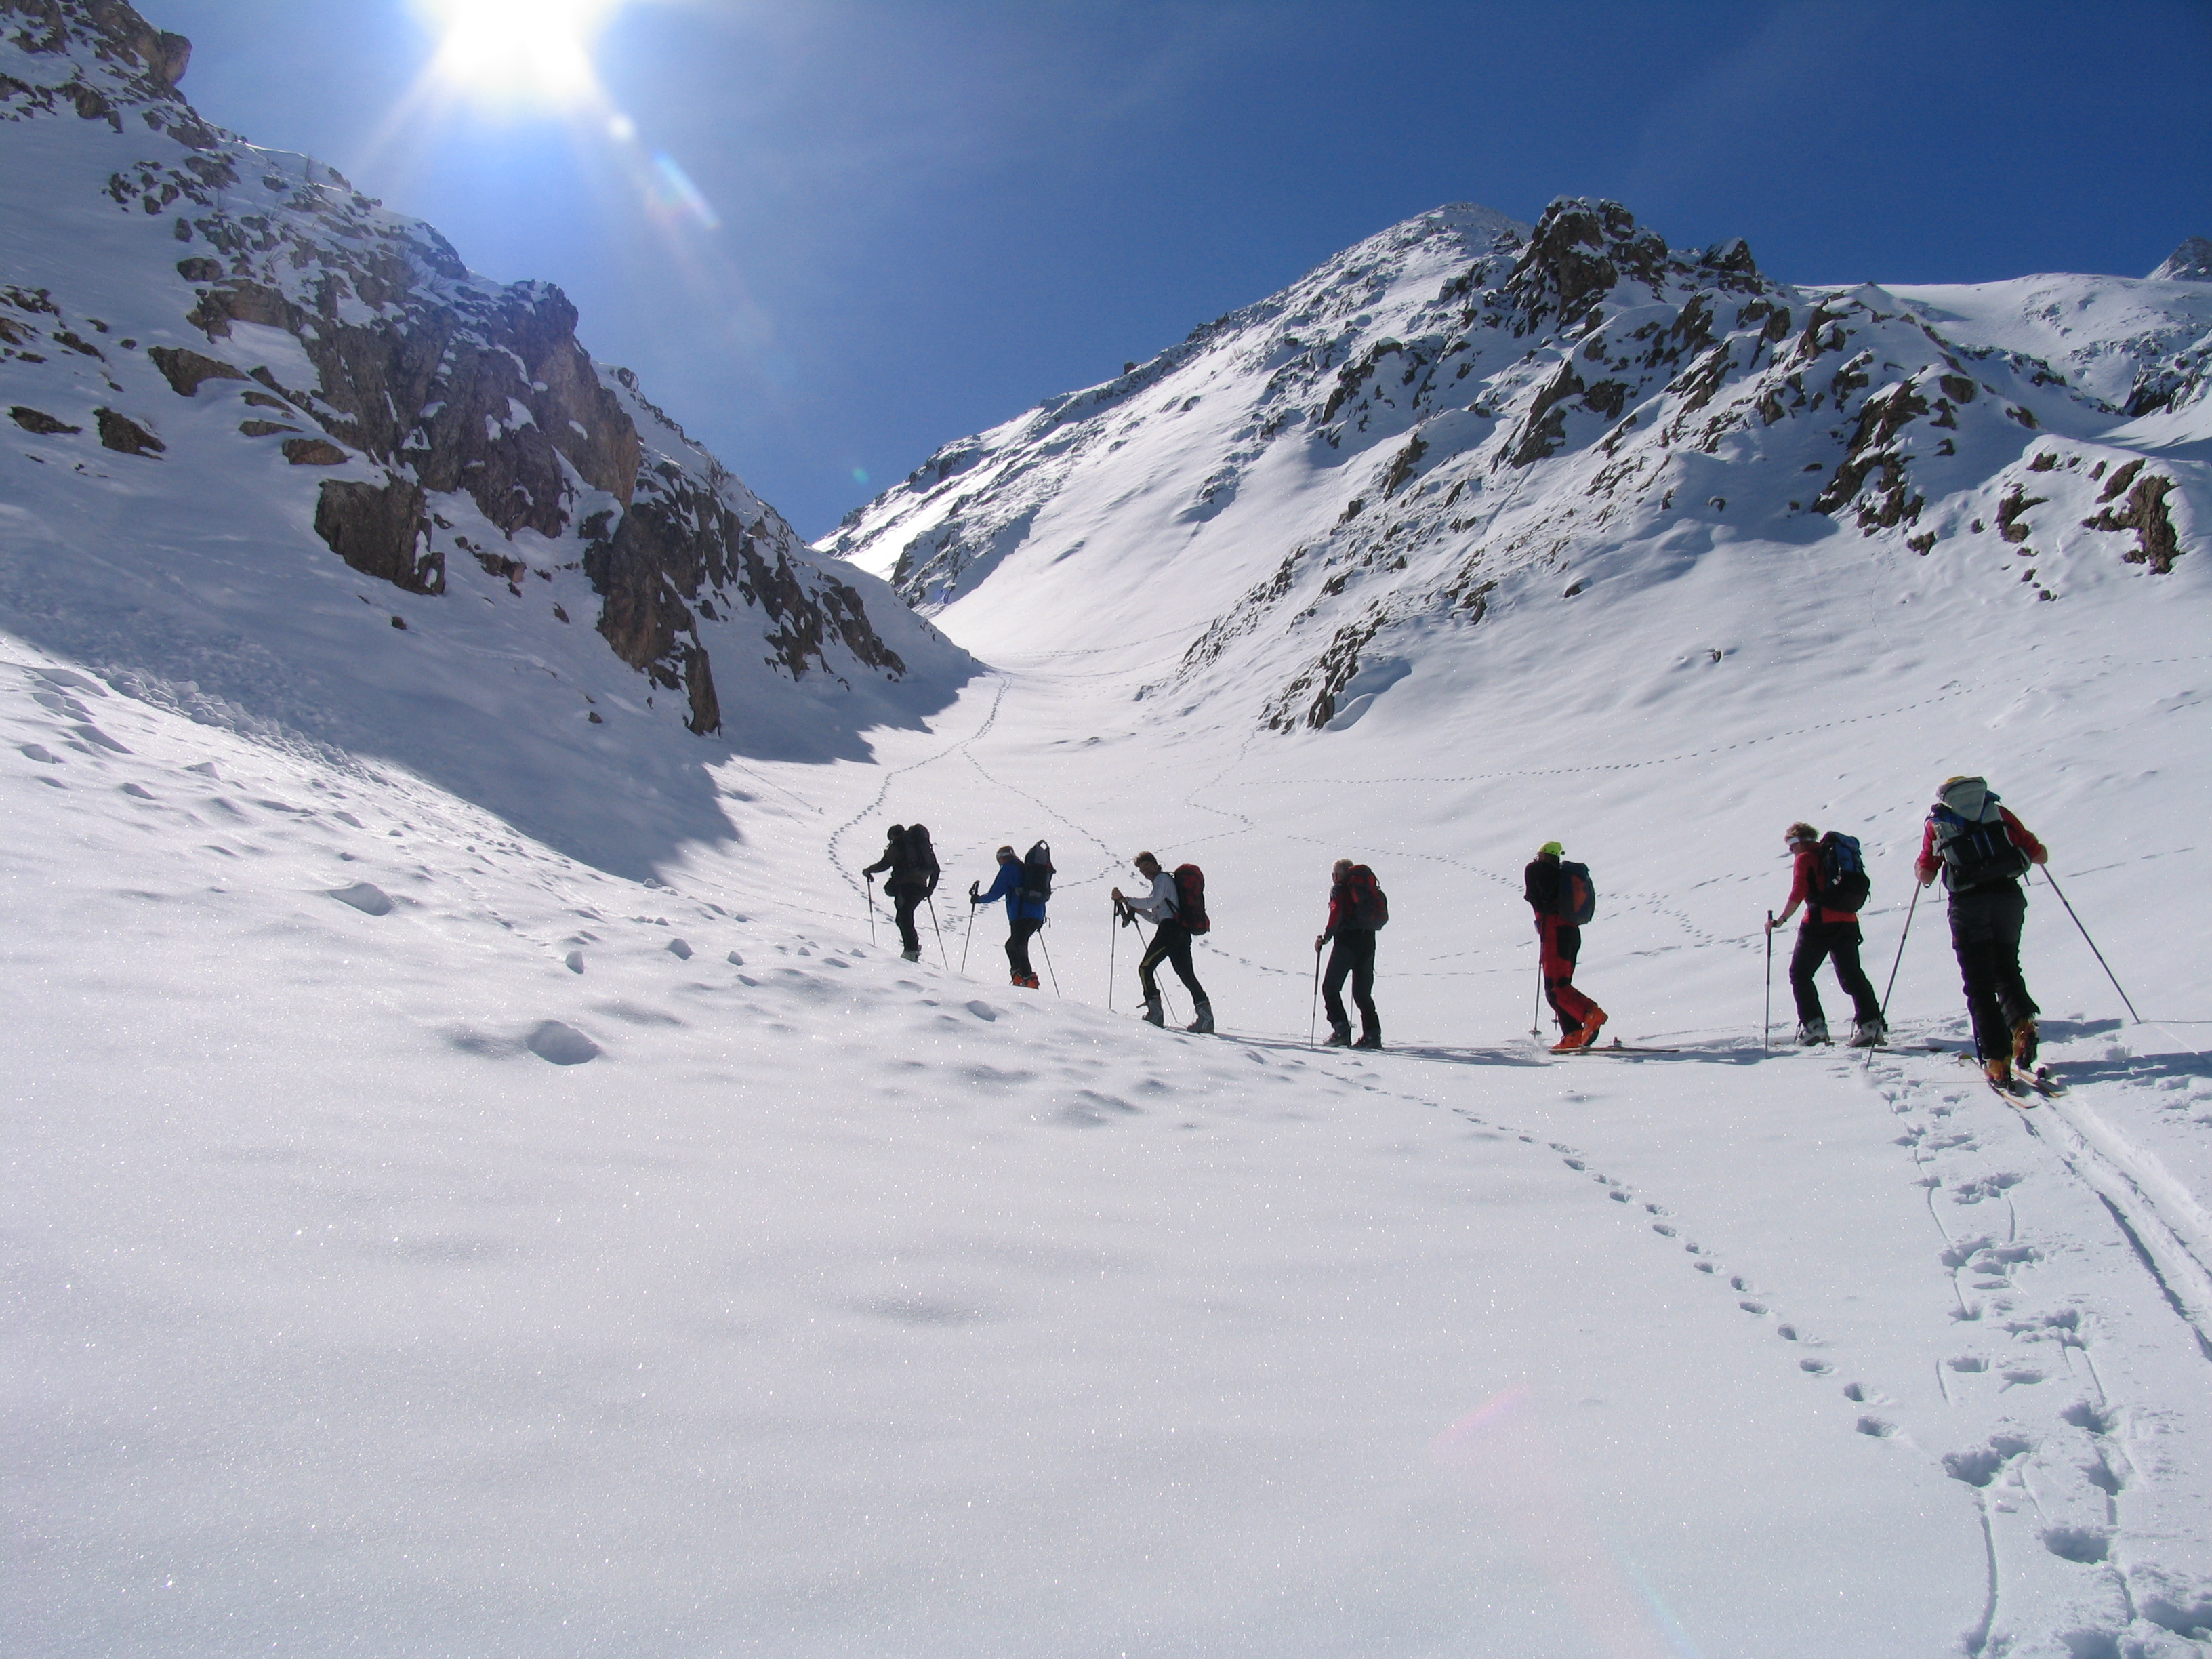 www.skiararat.com, Ağrı Dağı or Mount Ararat